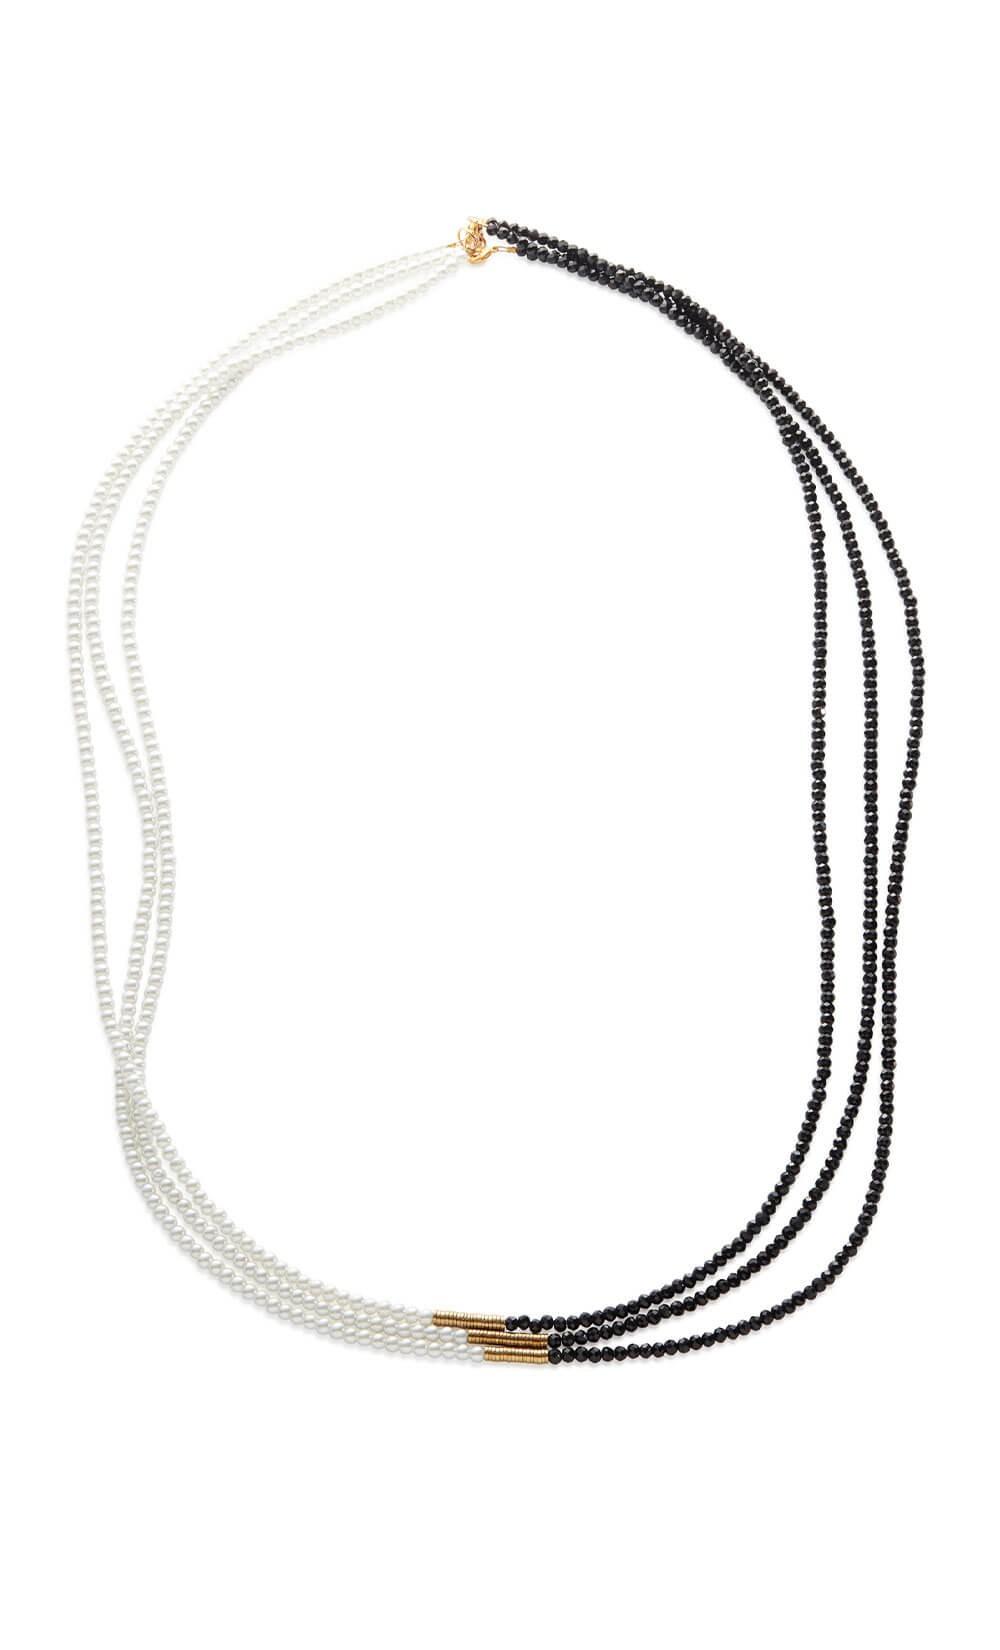 Black & Pearl Necklace